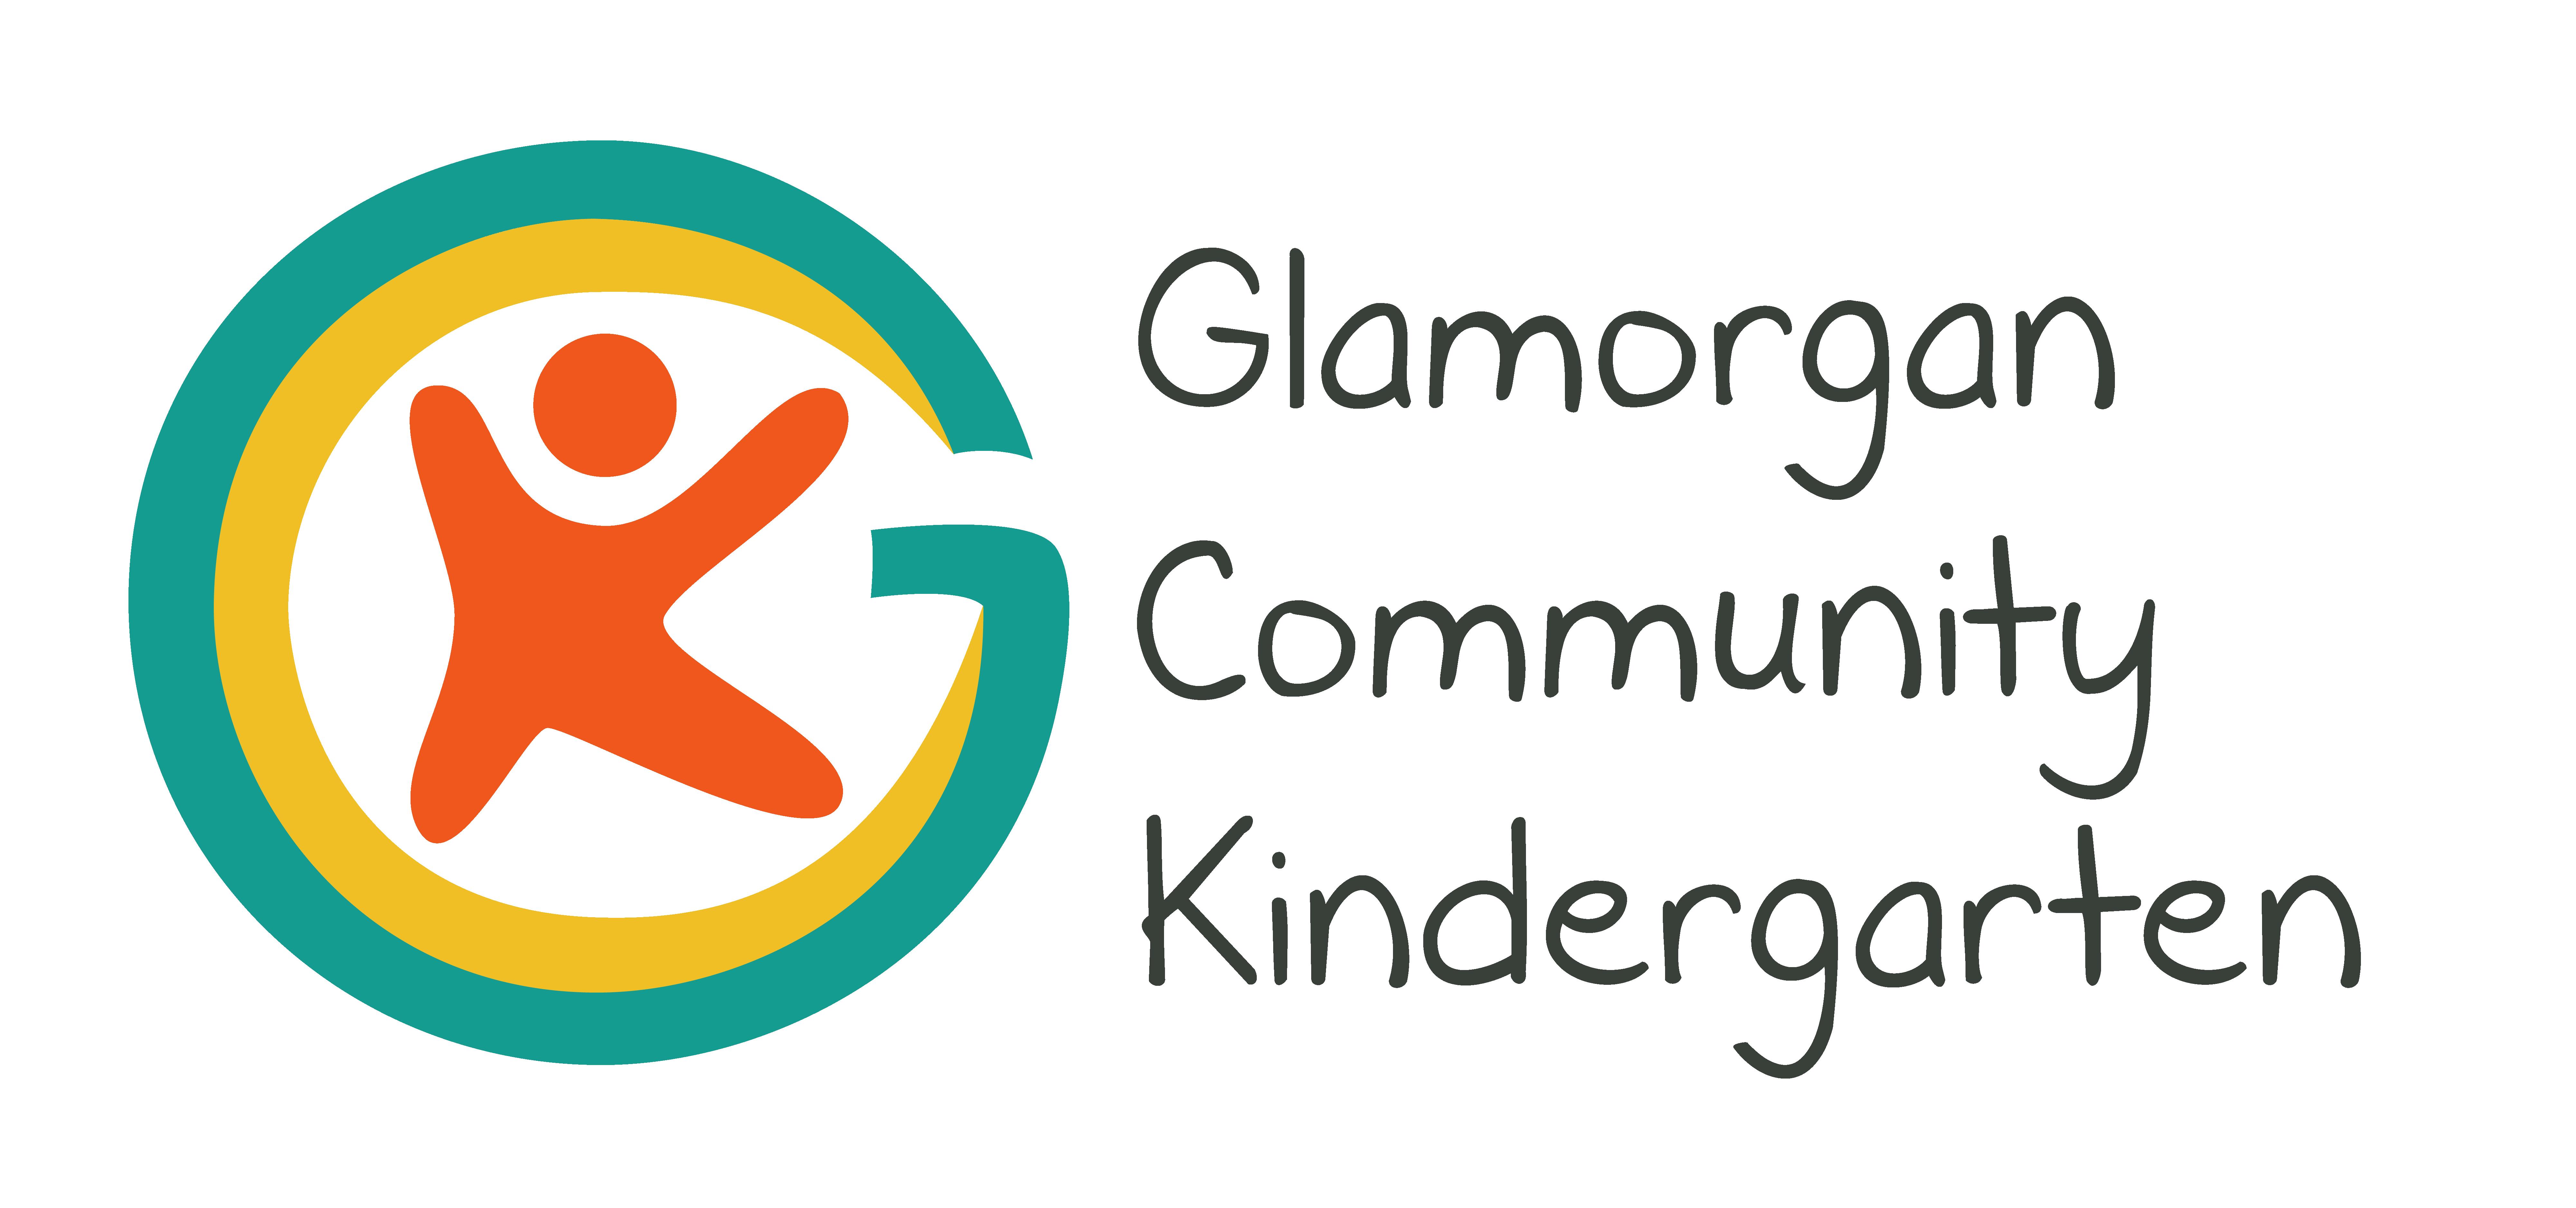 Glamorgan Community Kindergarten Logo